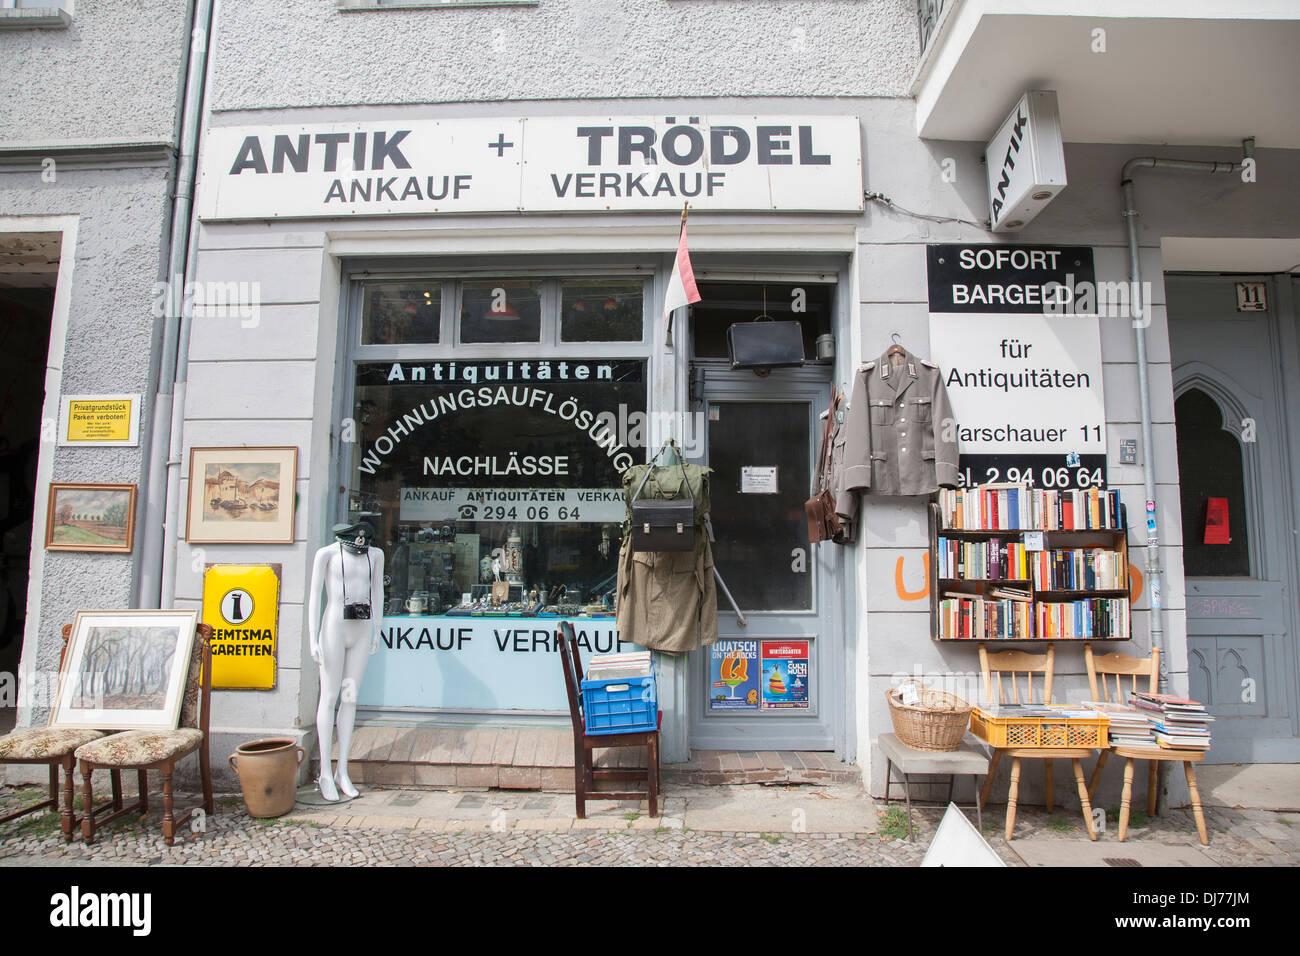 antik and trodel antique shop in warschauer str berlin germany stock photo royalty free image. Black Bedroom Furniture Sets. Home Design Ideas